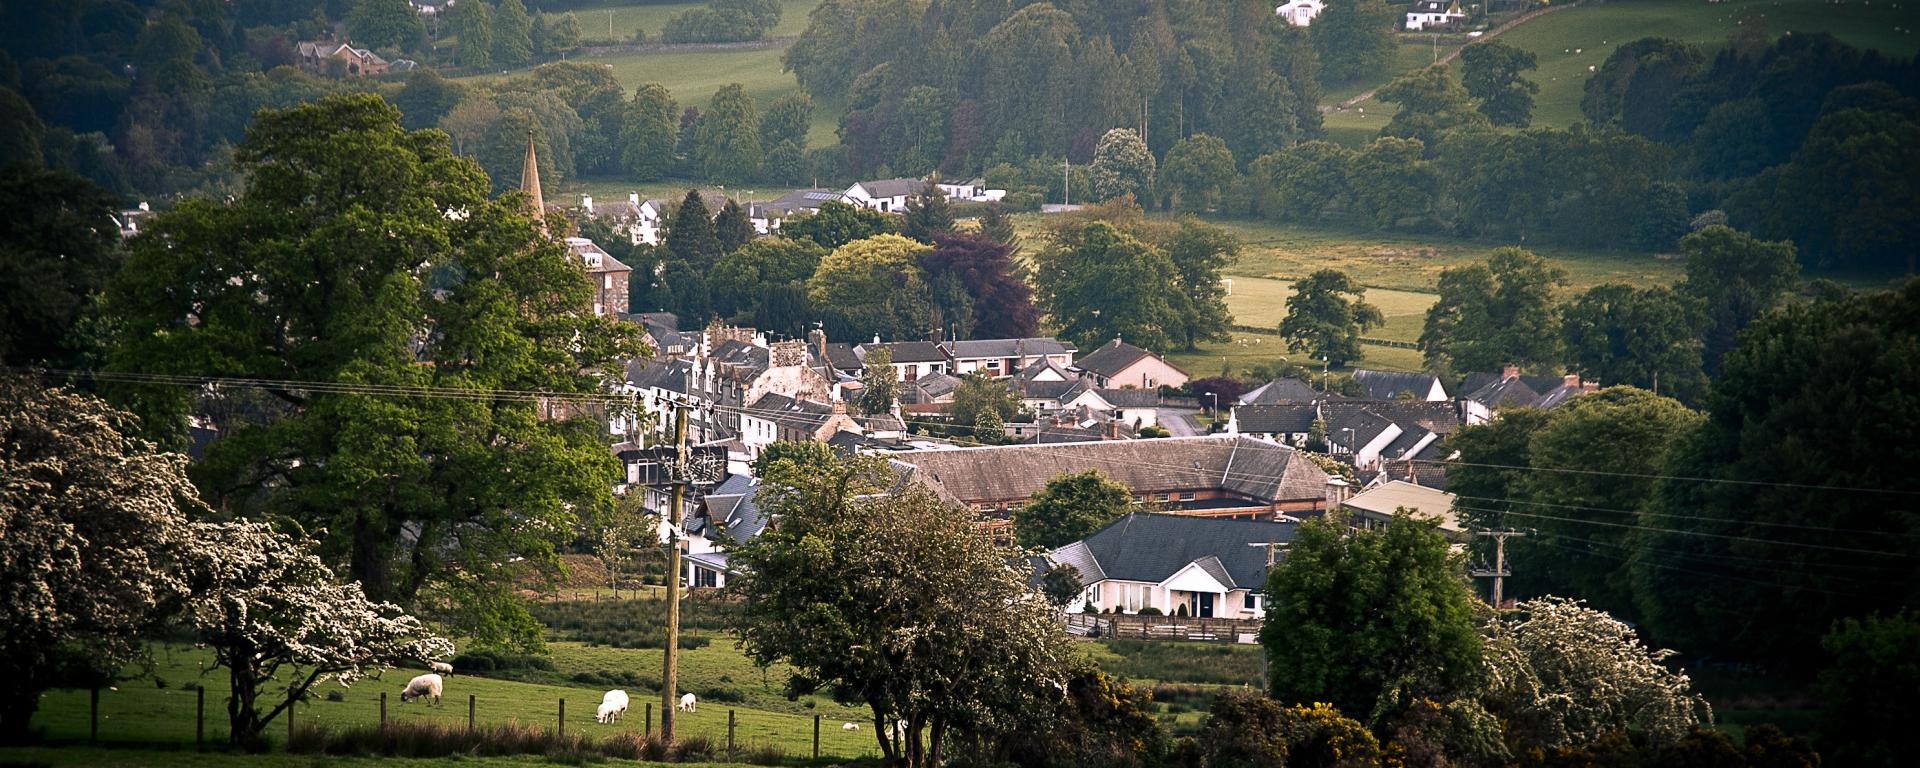 Moffat, Scotland, from Gallow Hill